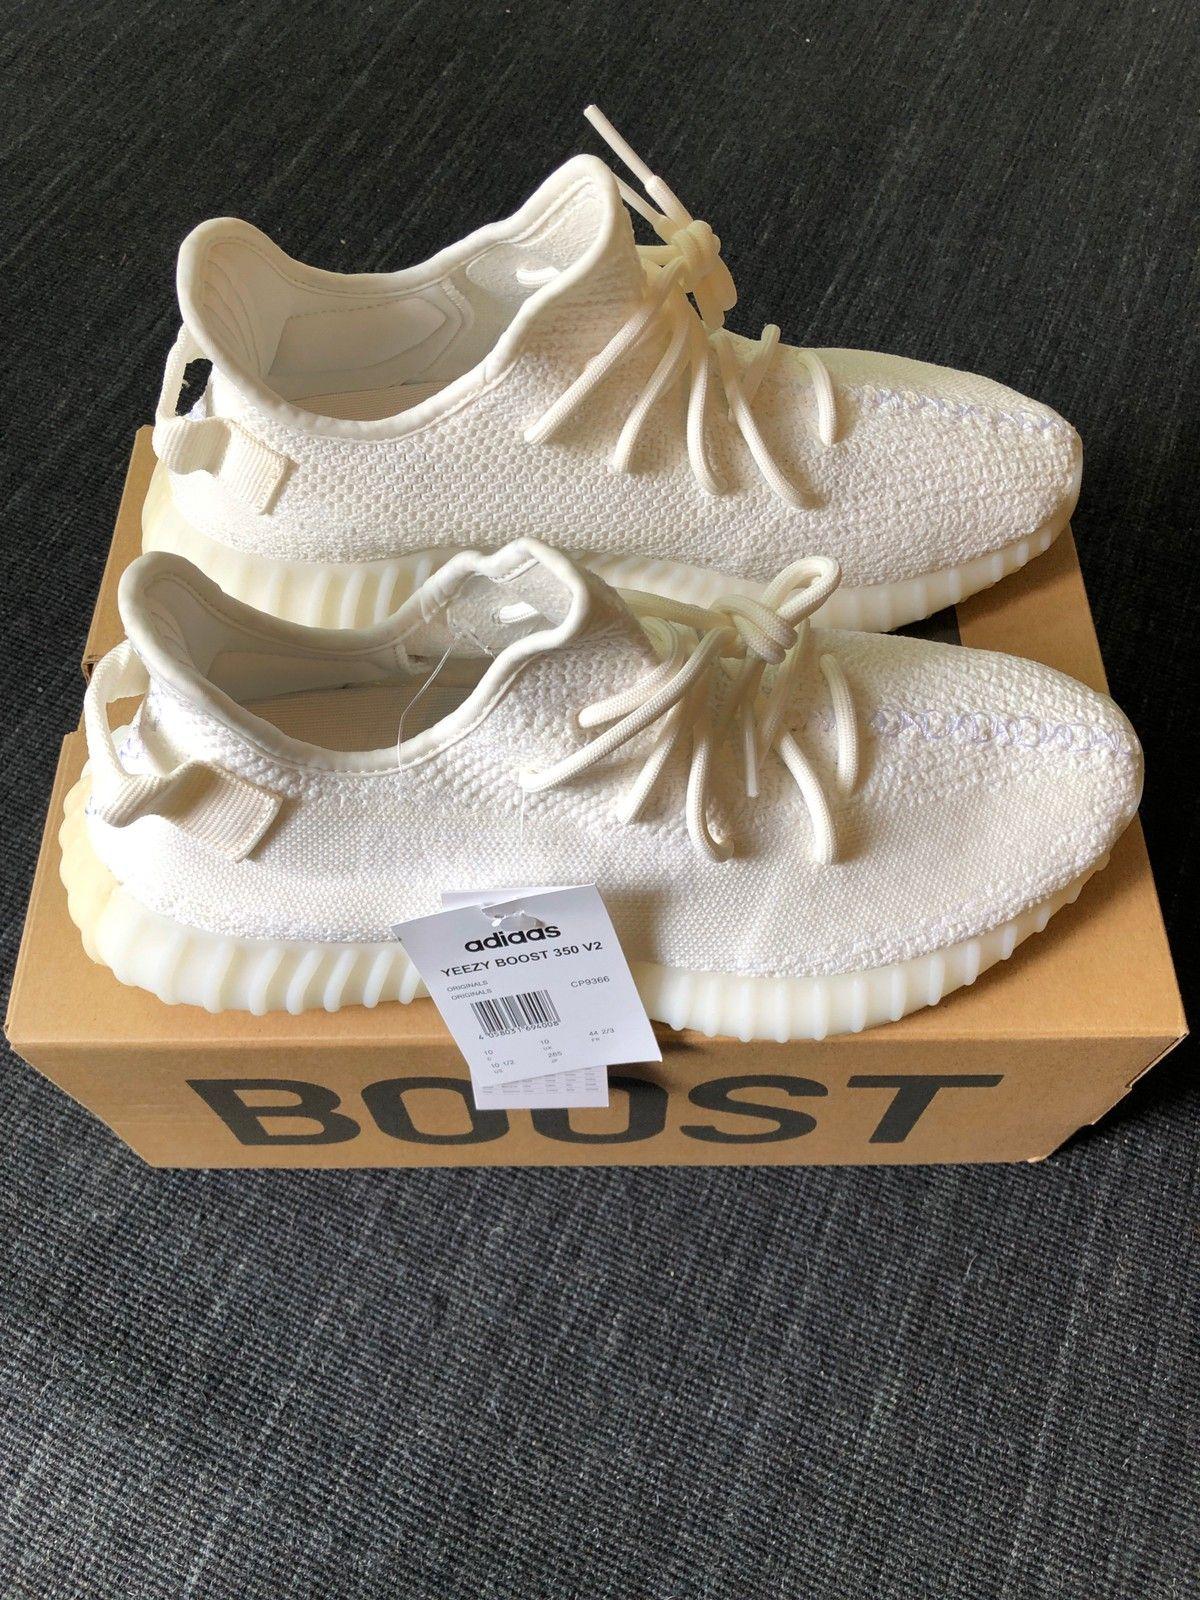 adidas yeezy boost 350 v2 white cream